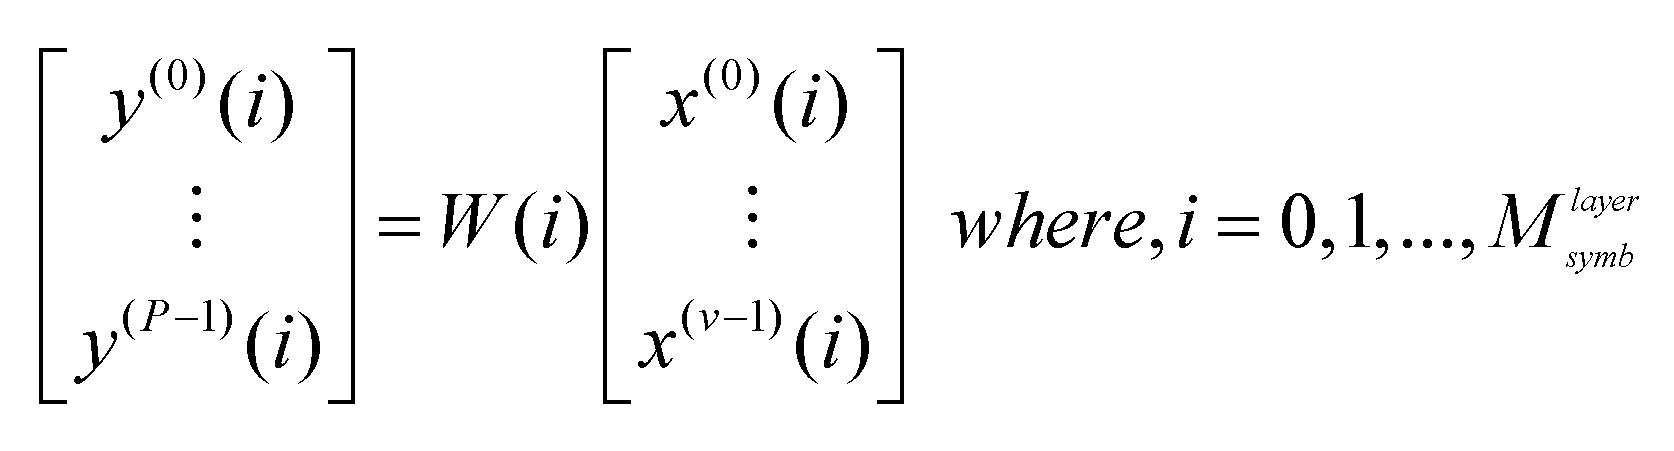 Figure 112010009825391-pat00009